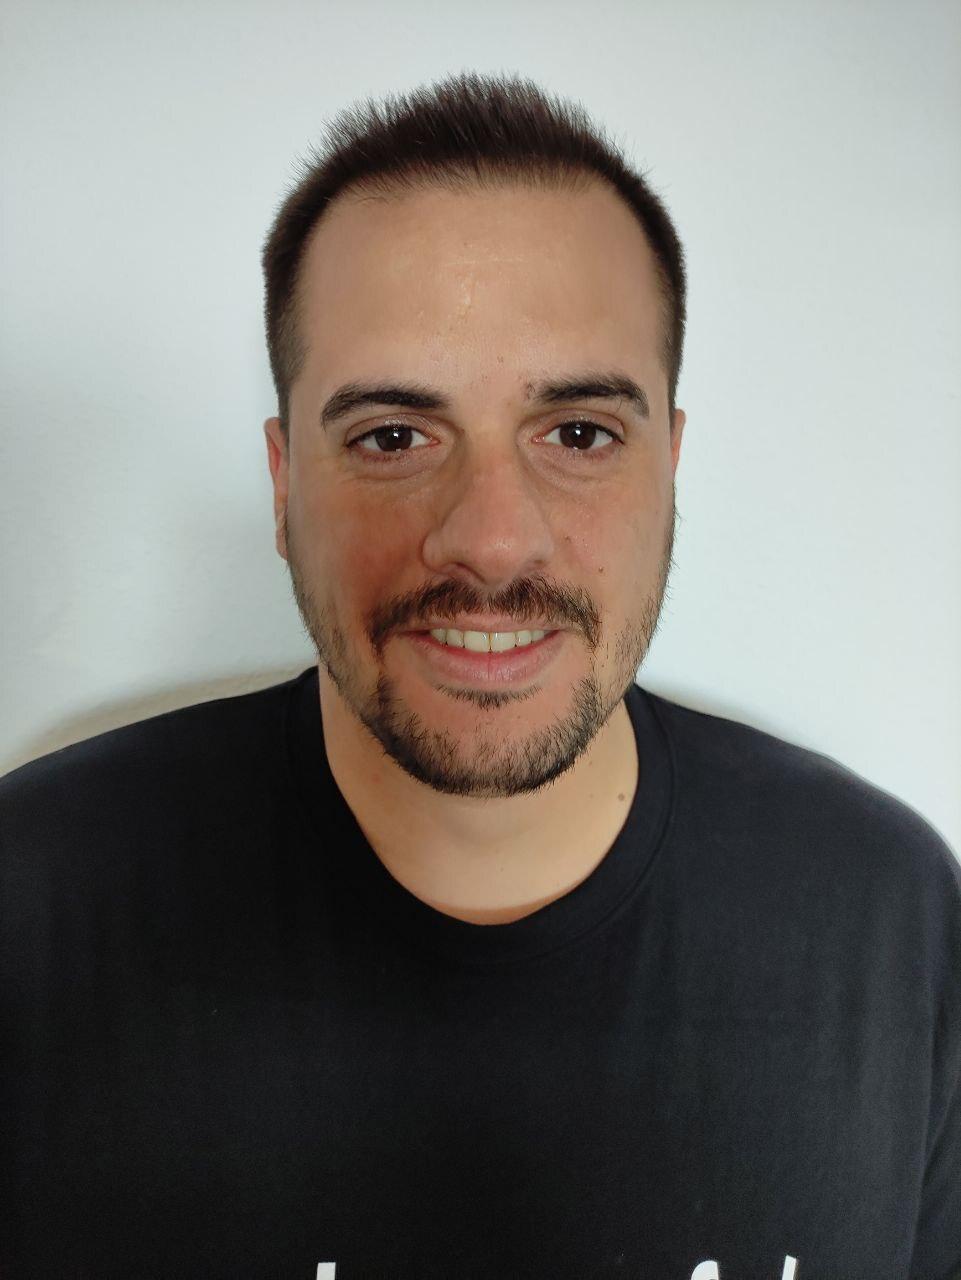 Guillermo Caracuel